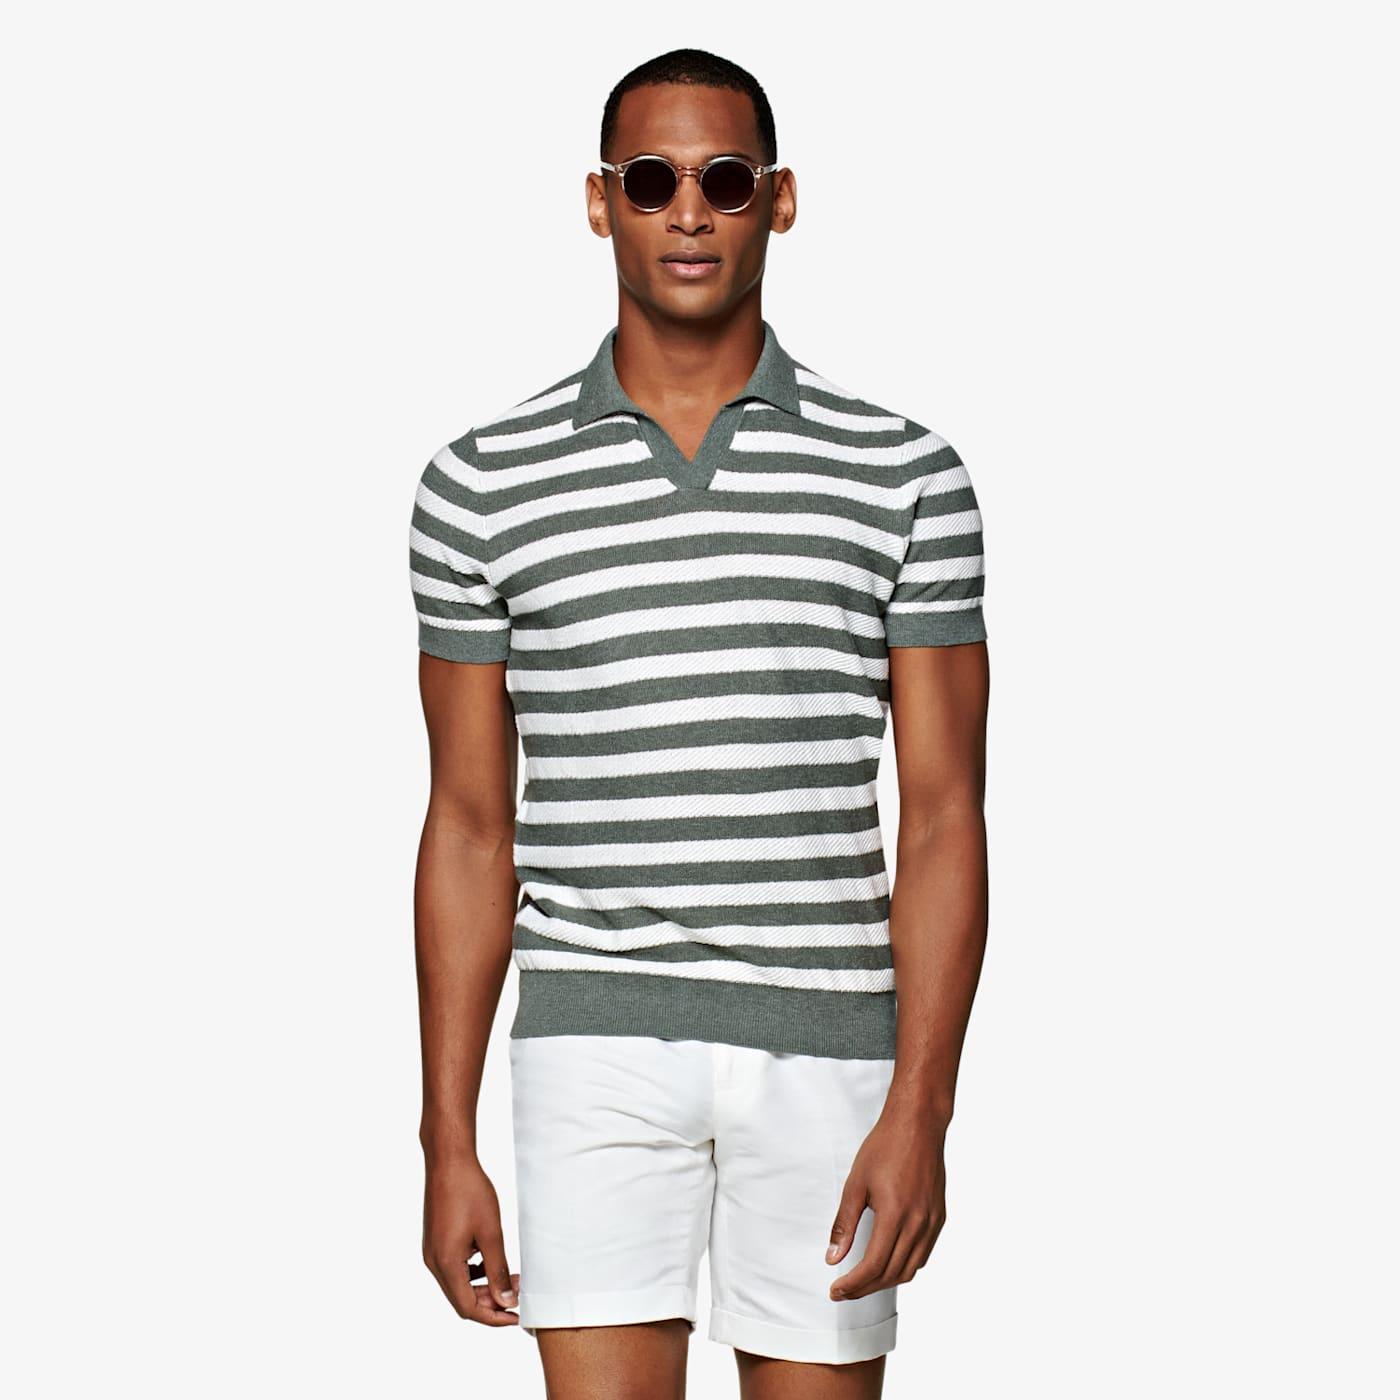 1930s Mens Shirts | Dress Shirts, Polo Shirts, Work Shirts Dark Green Textured Stripe Buttonless Polo $79.00 AT vintagedancer.com